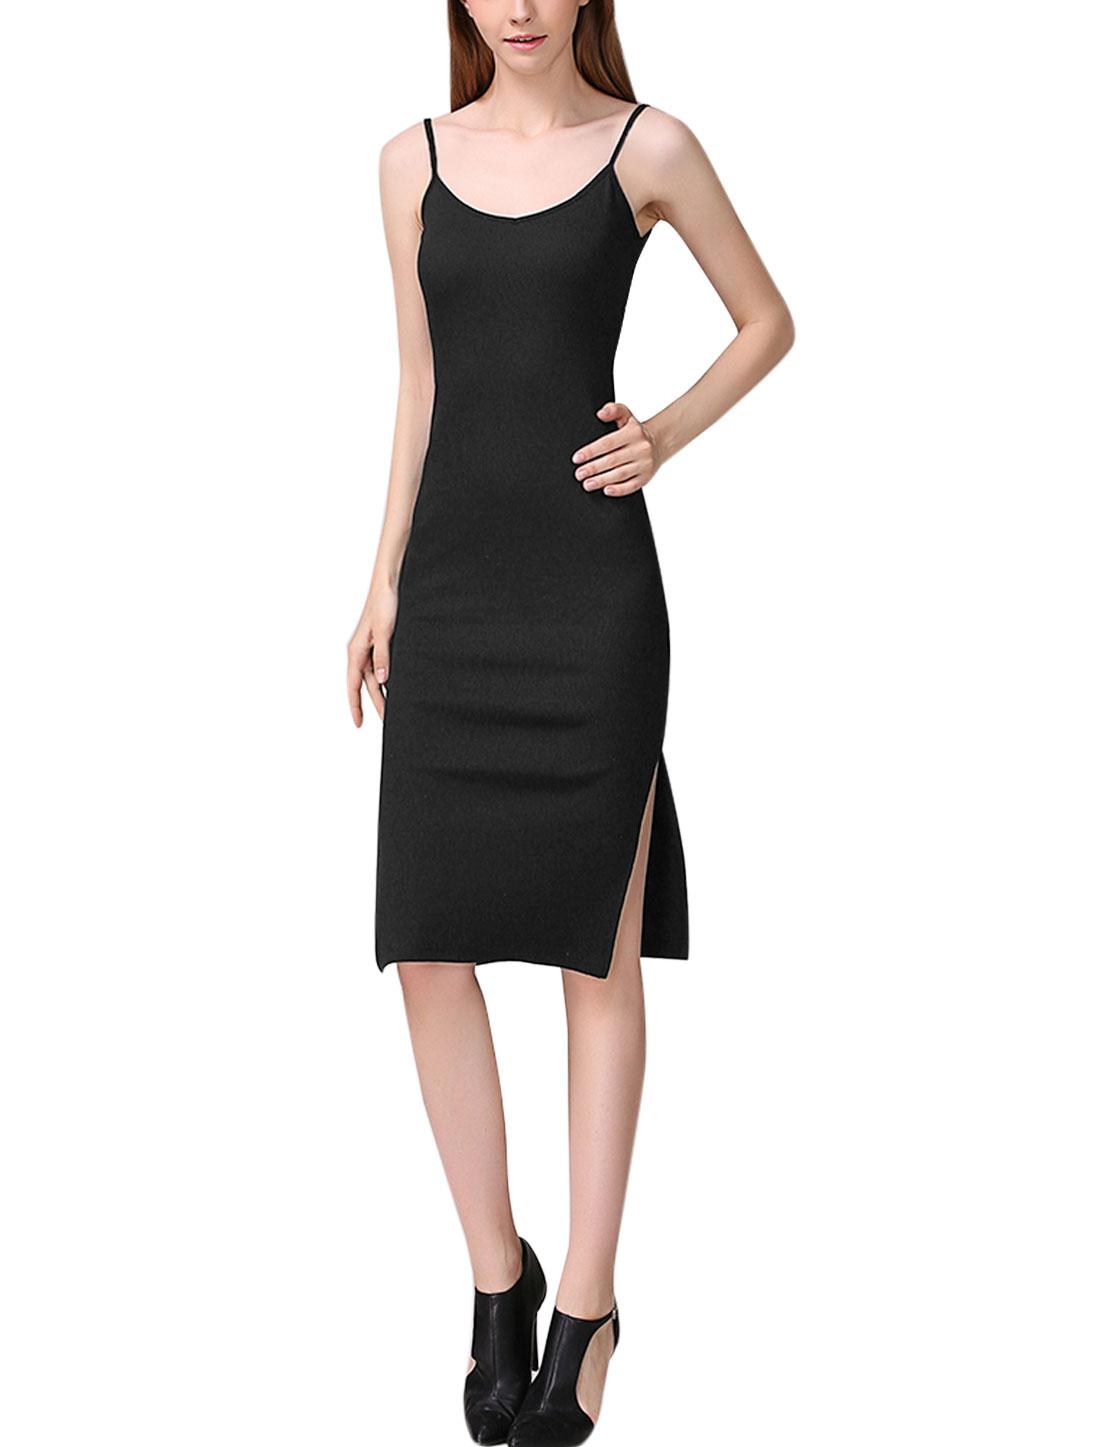 Women Spaghetti Straps V Neck Split Sides Knitted Dress Black XS